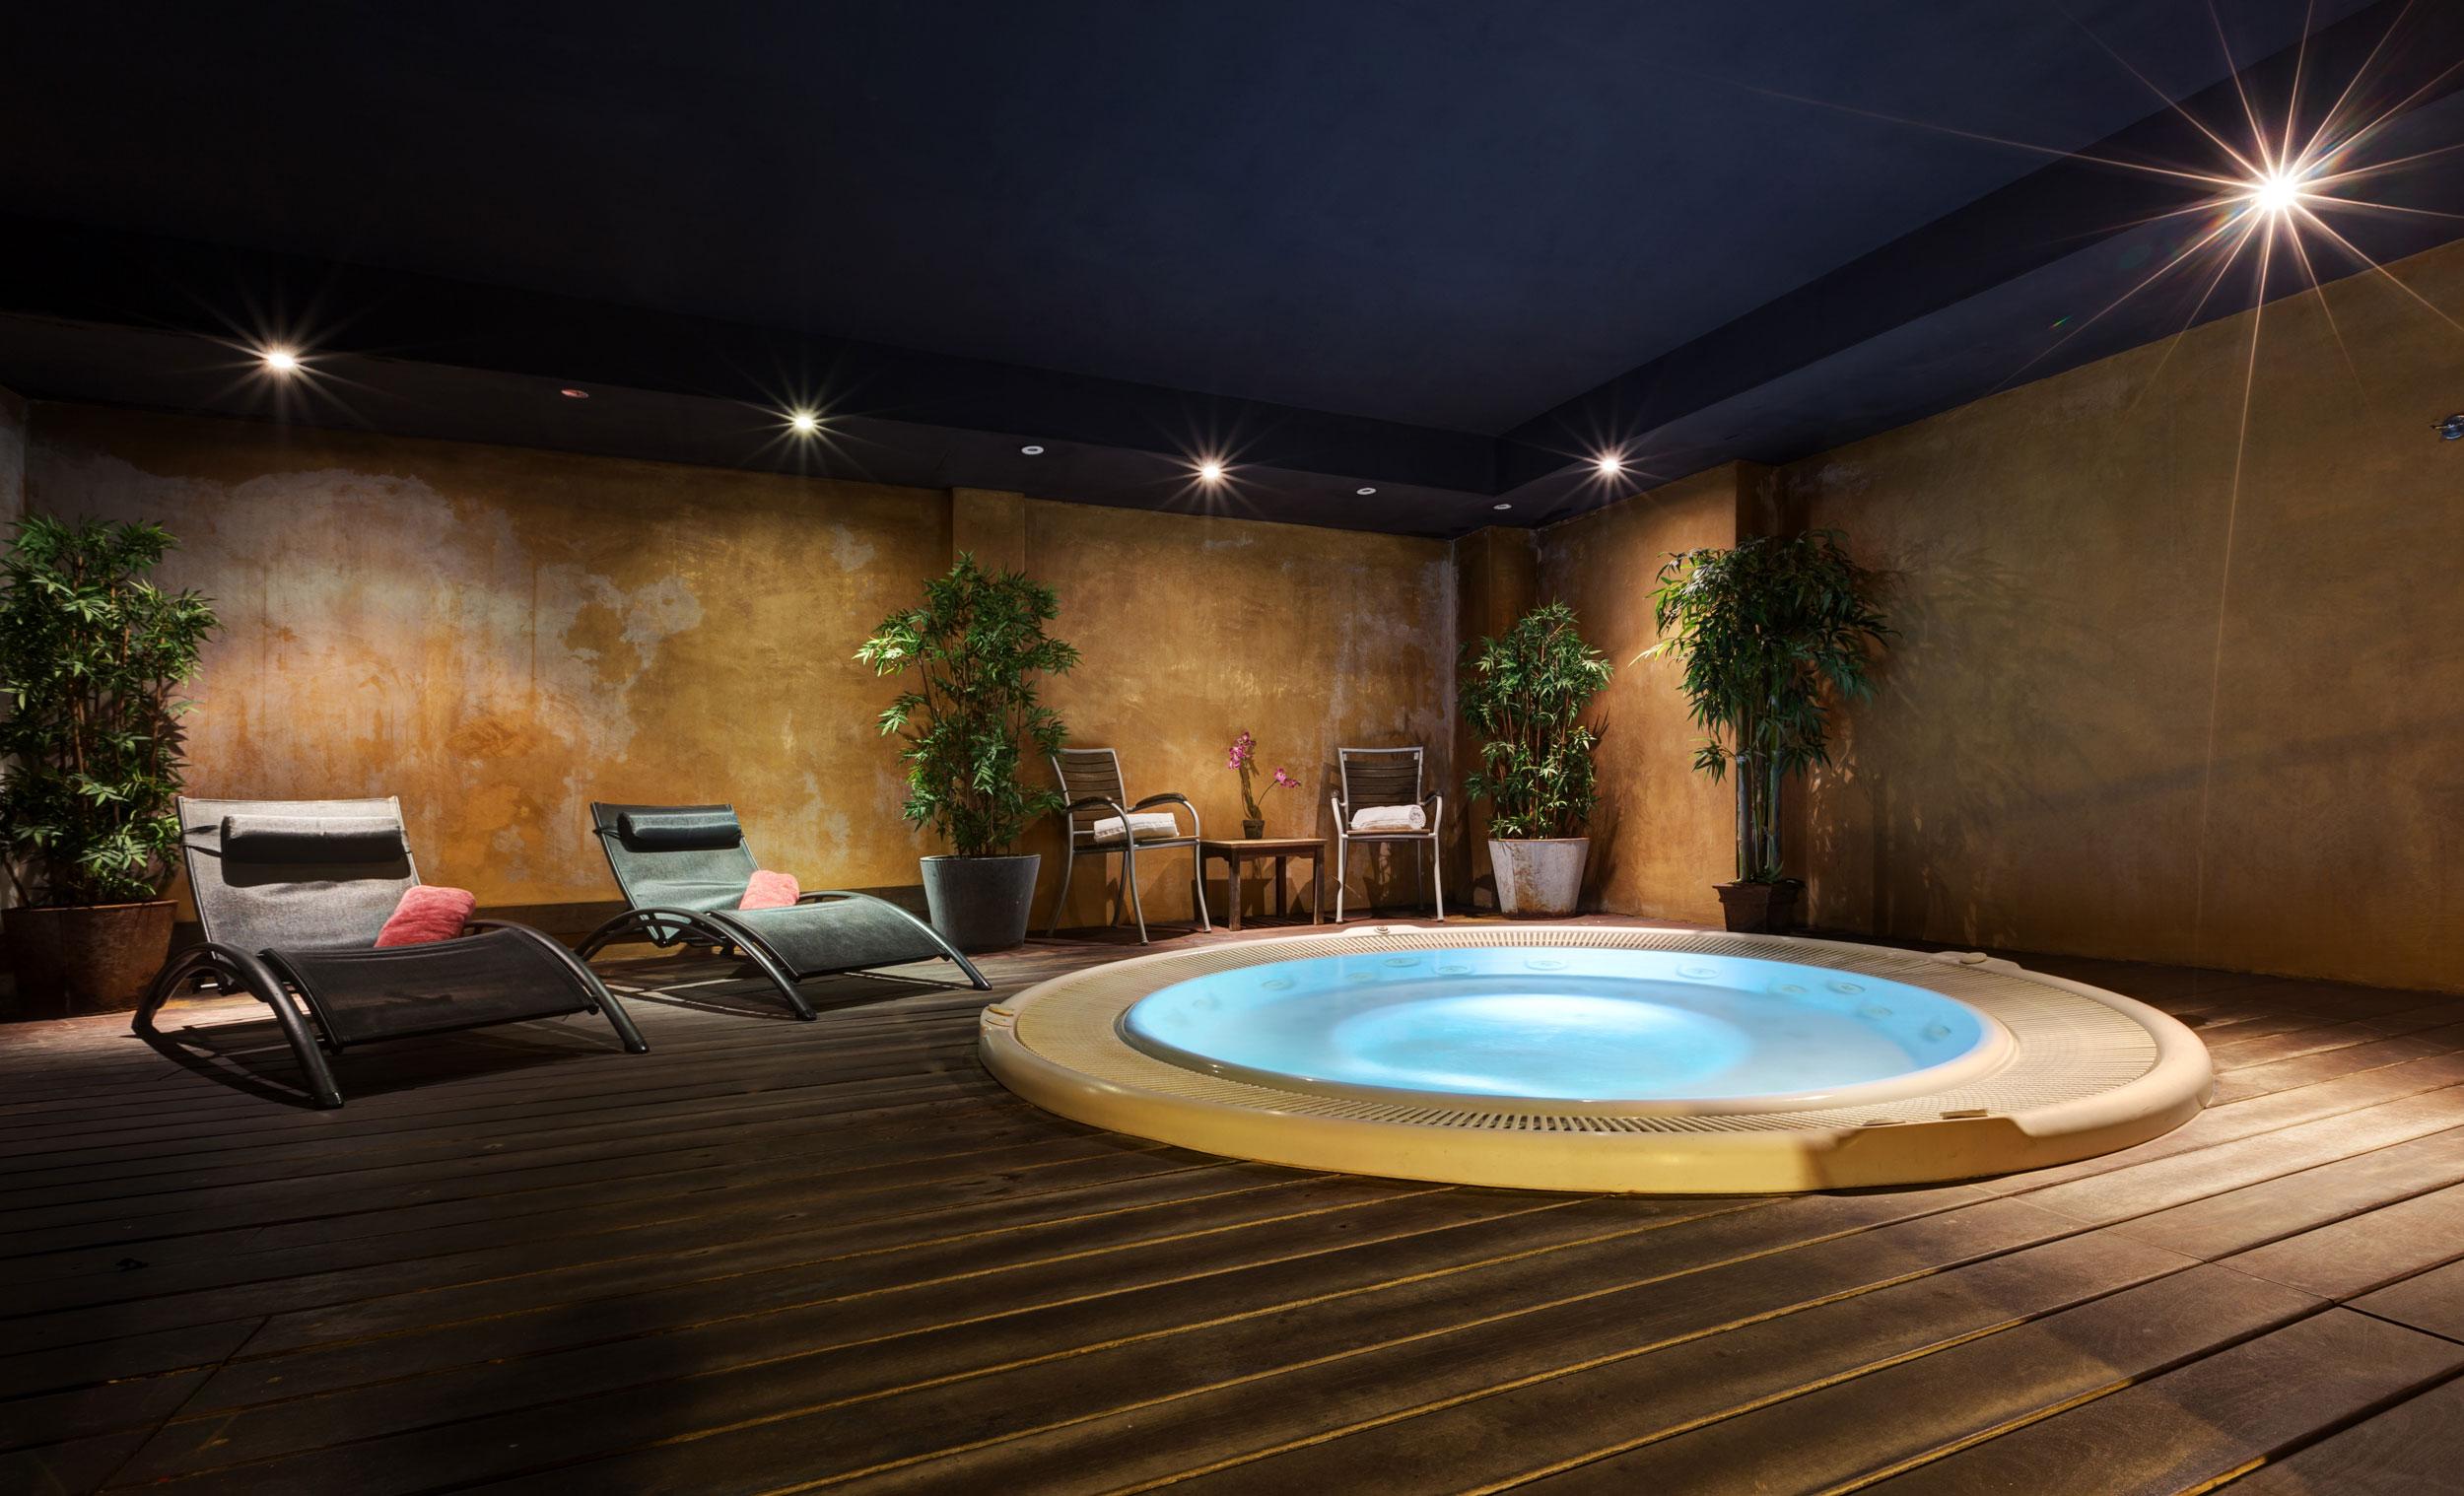 Presentation De L Hotel Hotel Acevi Villarroel Barcelona